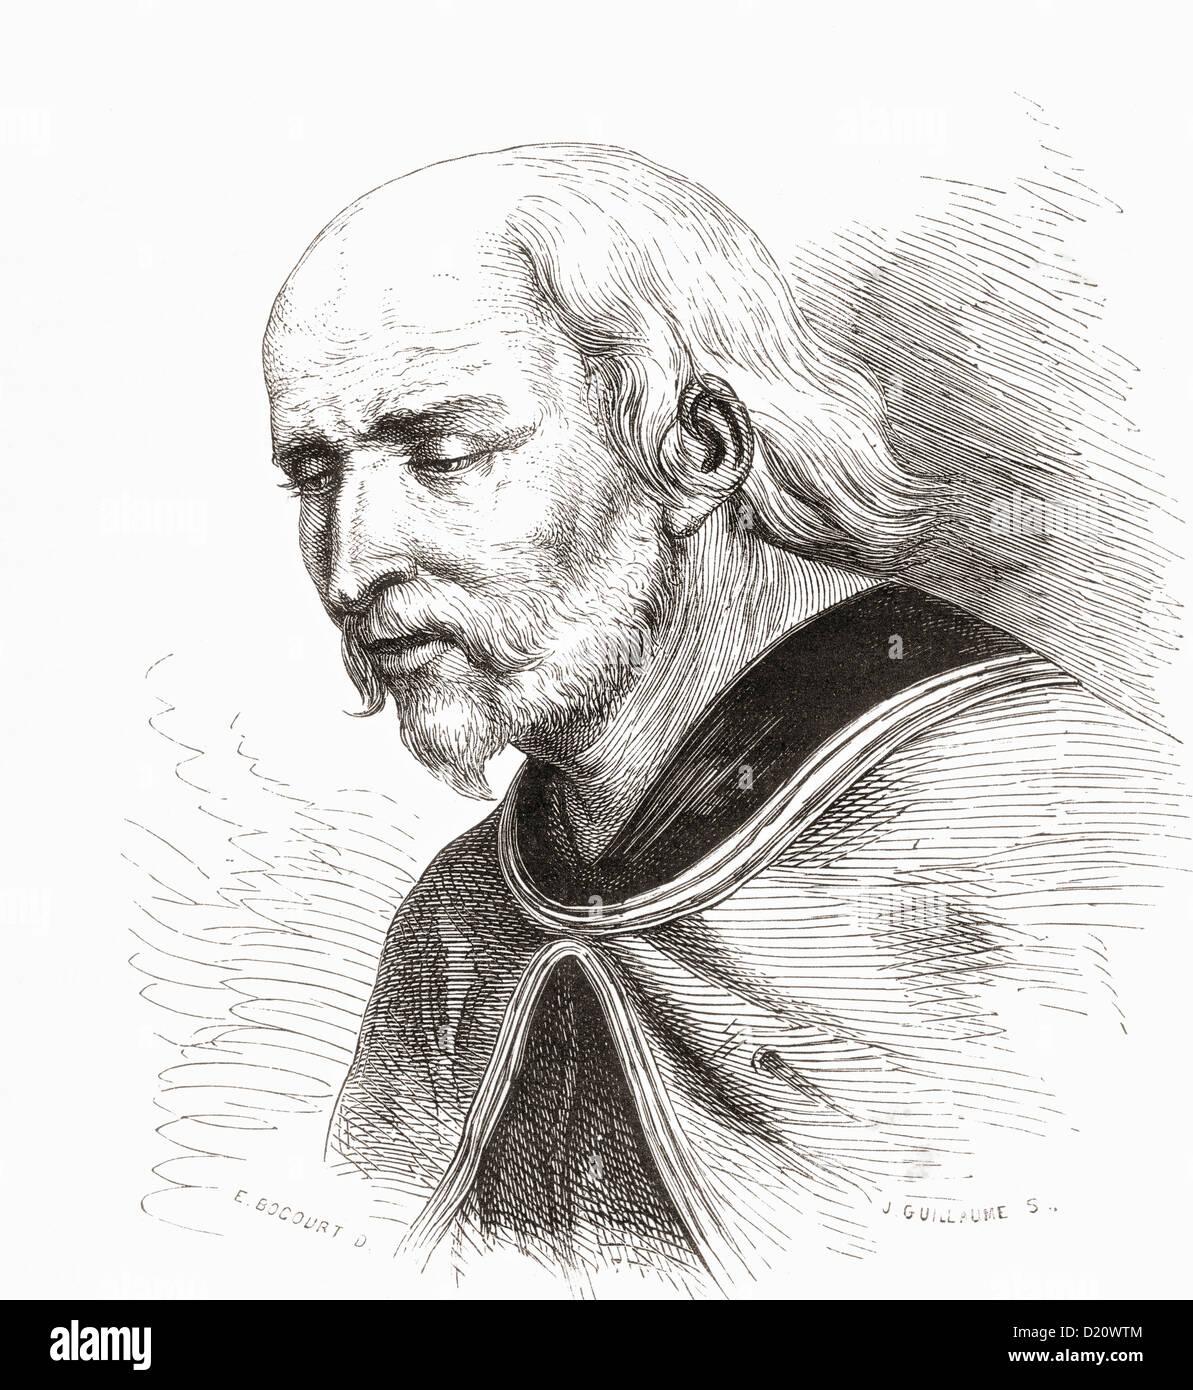 Bartholomäus Zeitblom, c. 1450 – c. 1519. German artist. - Stock Image